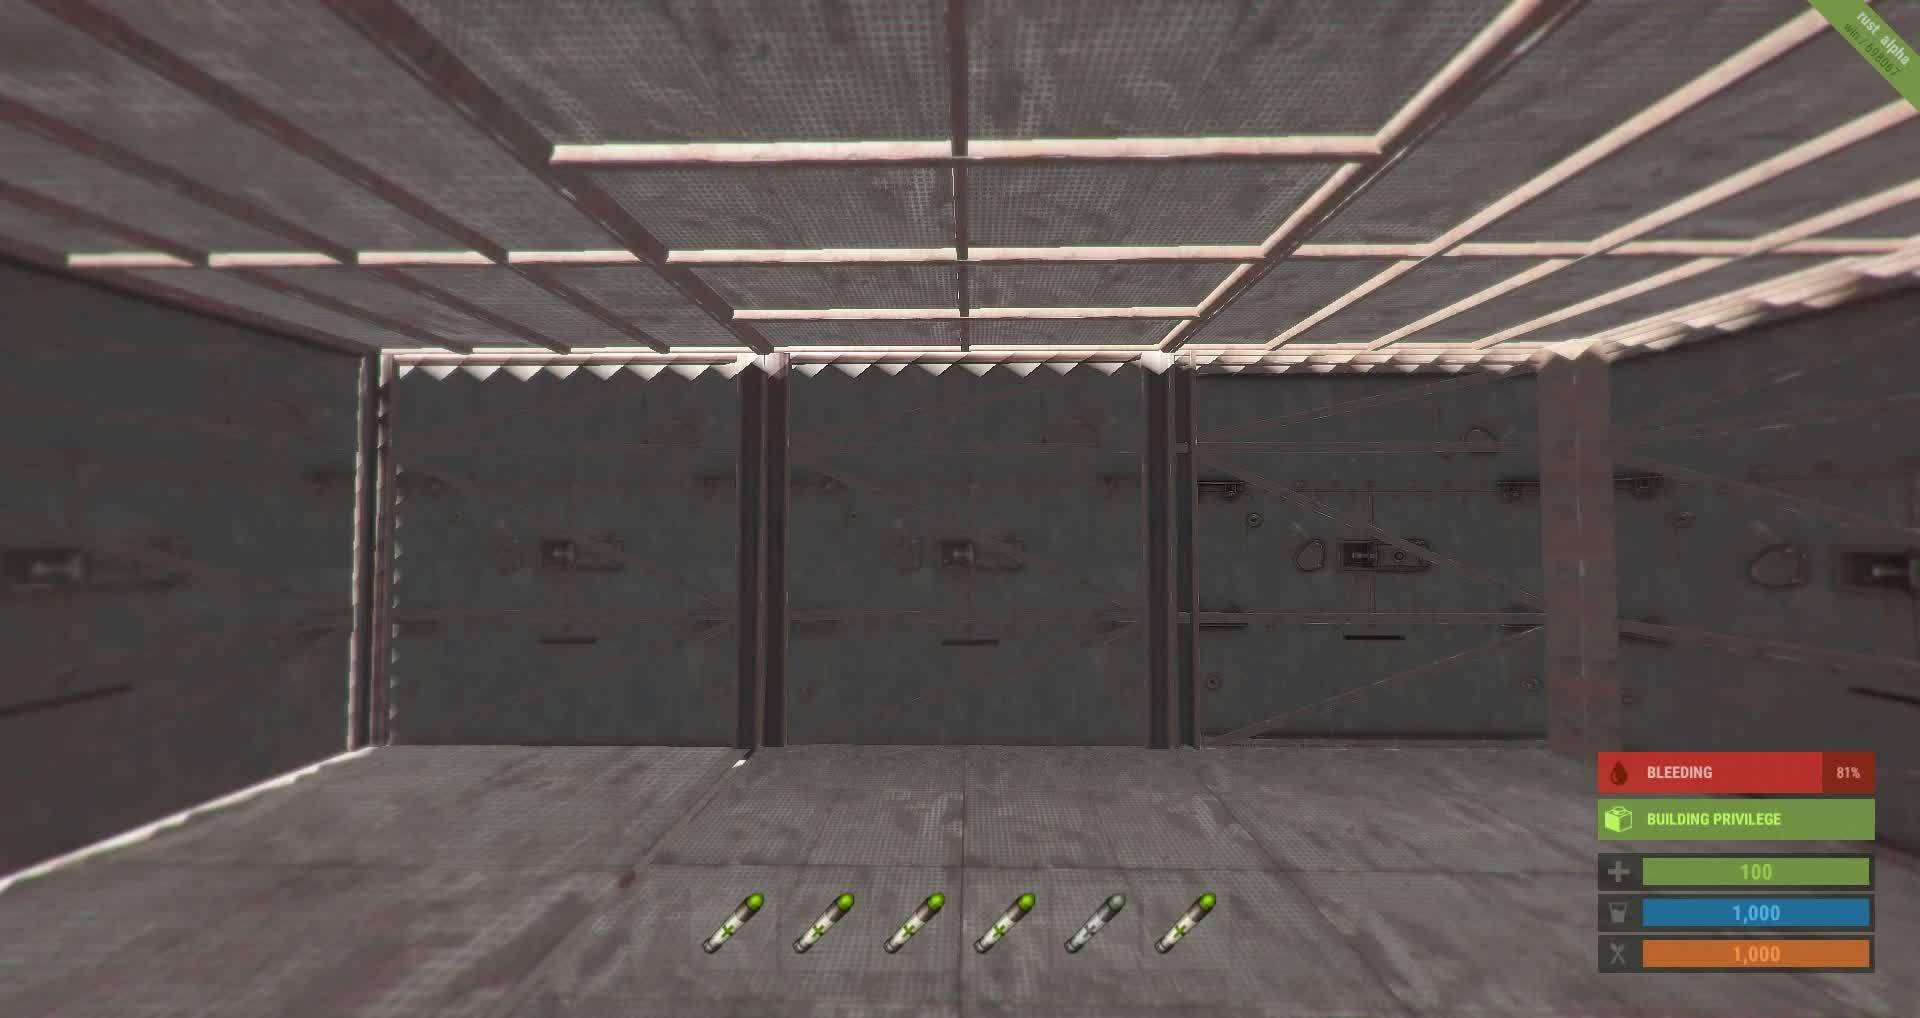 playrust, Custom SMG GIFs